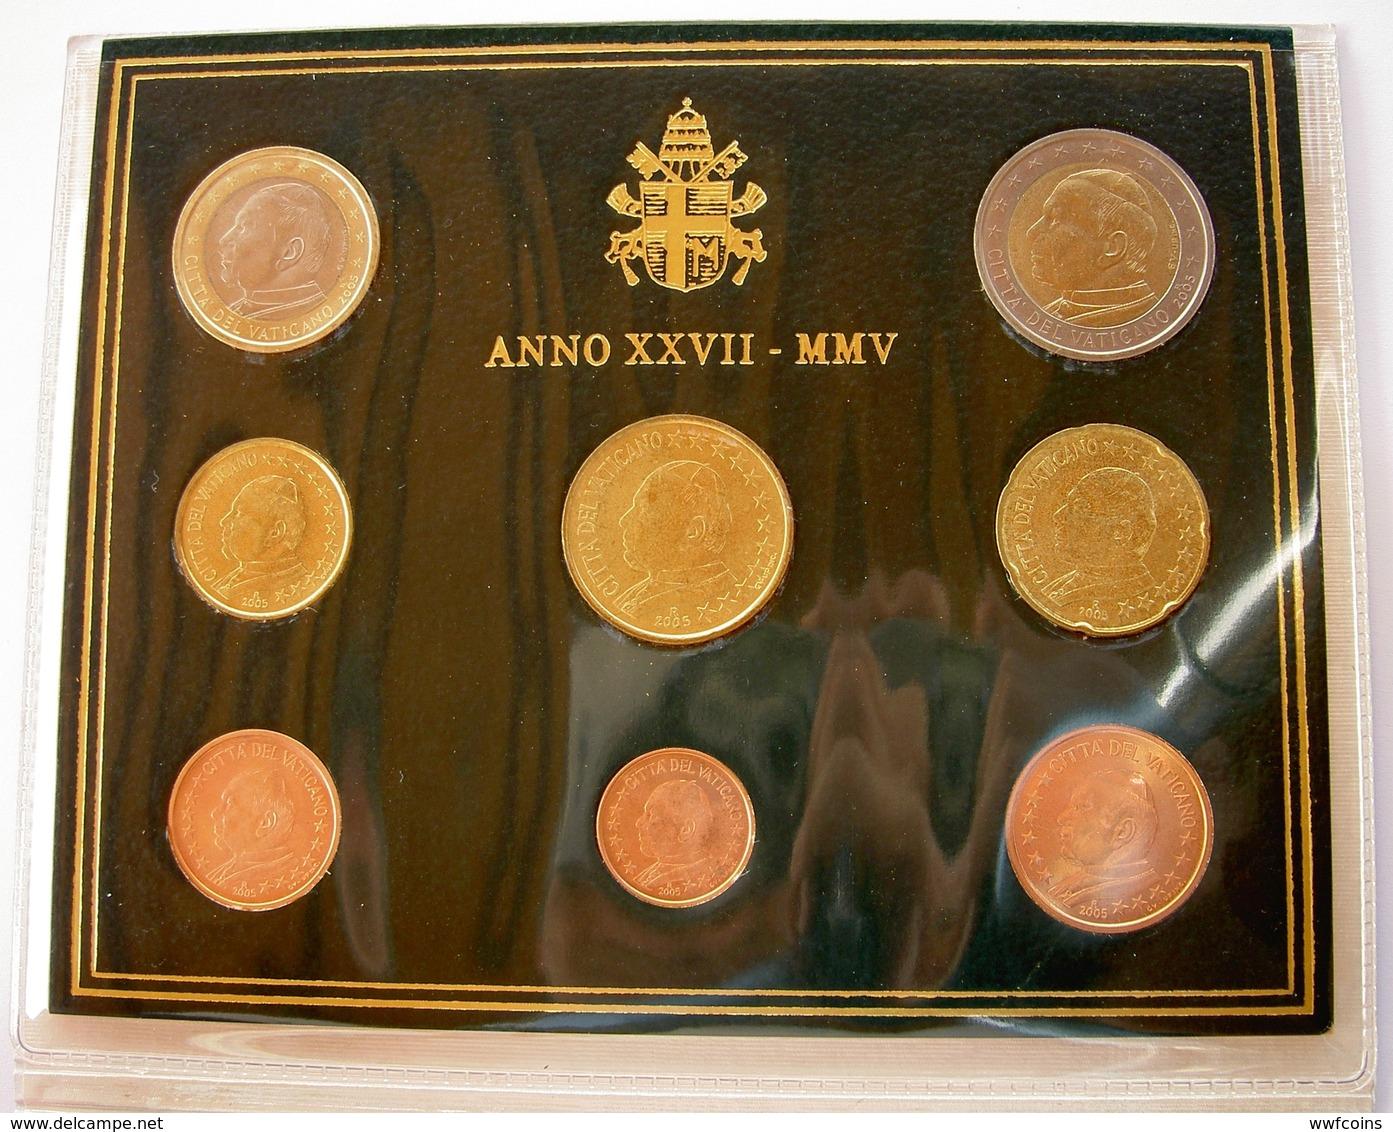 CITTA' DEL VATICANO DIVISIONALE 2005 XXVII PONTIFICATO GIOVANNI PAOLO II WOJTYLA JAN PAWEL VATICAN CITY ORIGINAL SET UNC - Vaticano